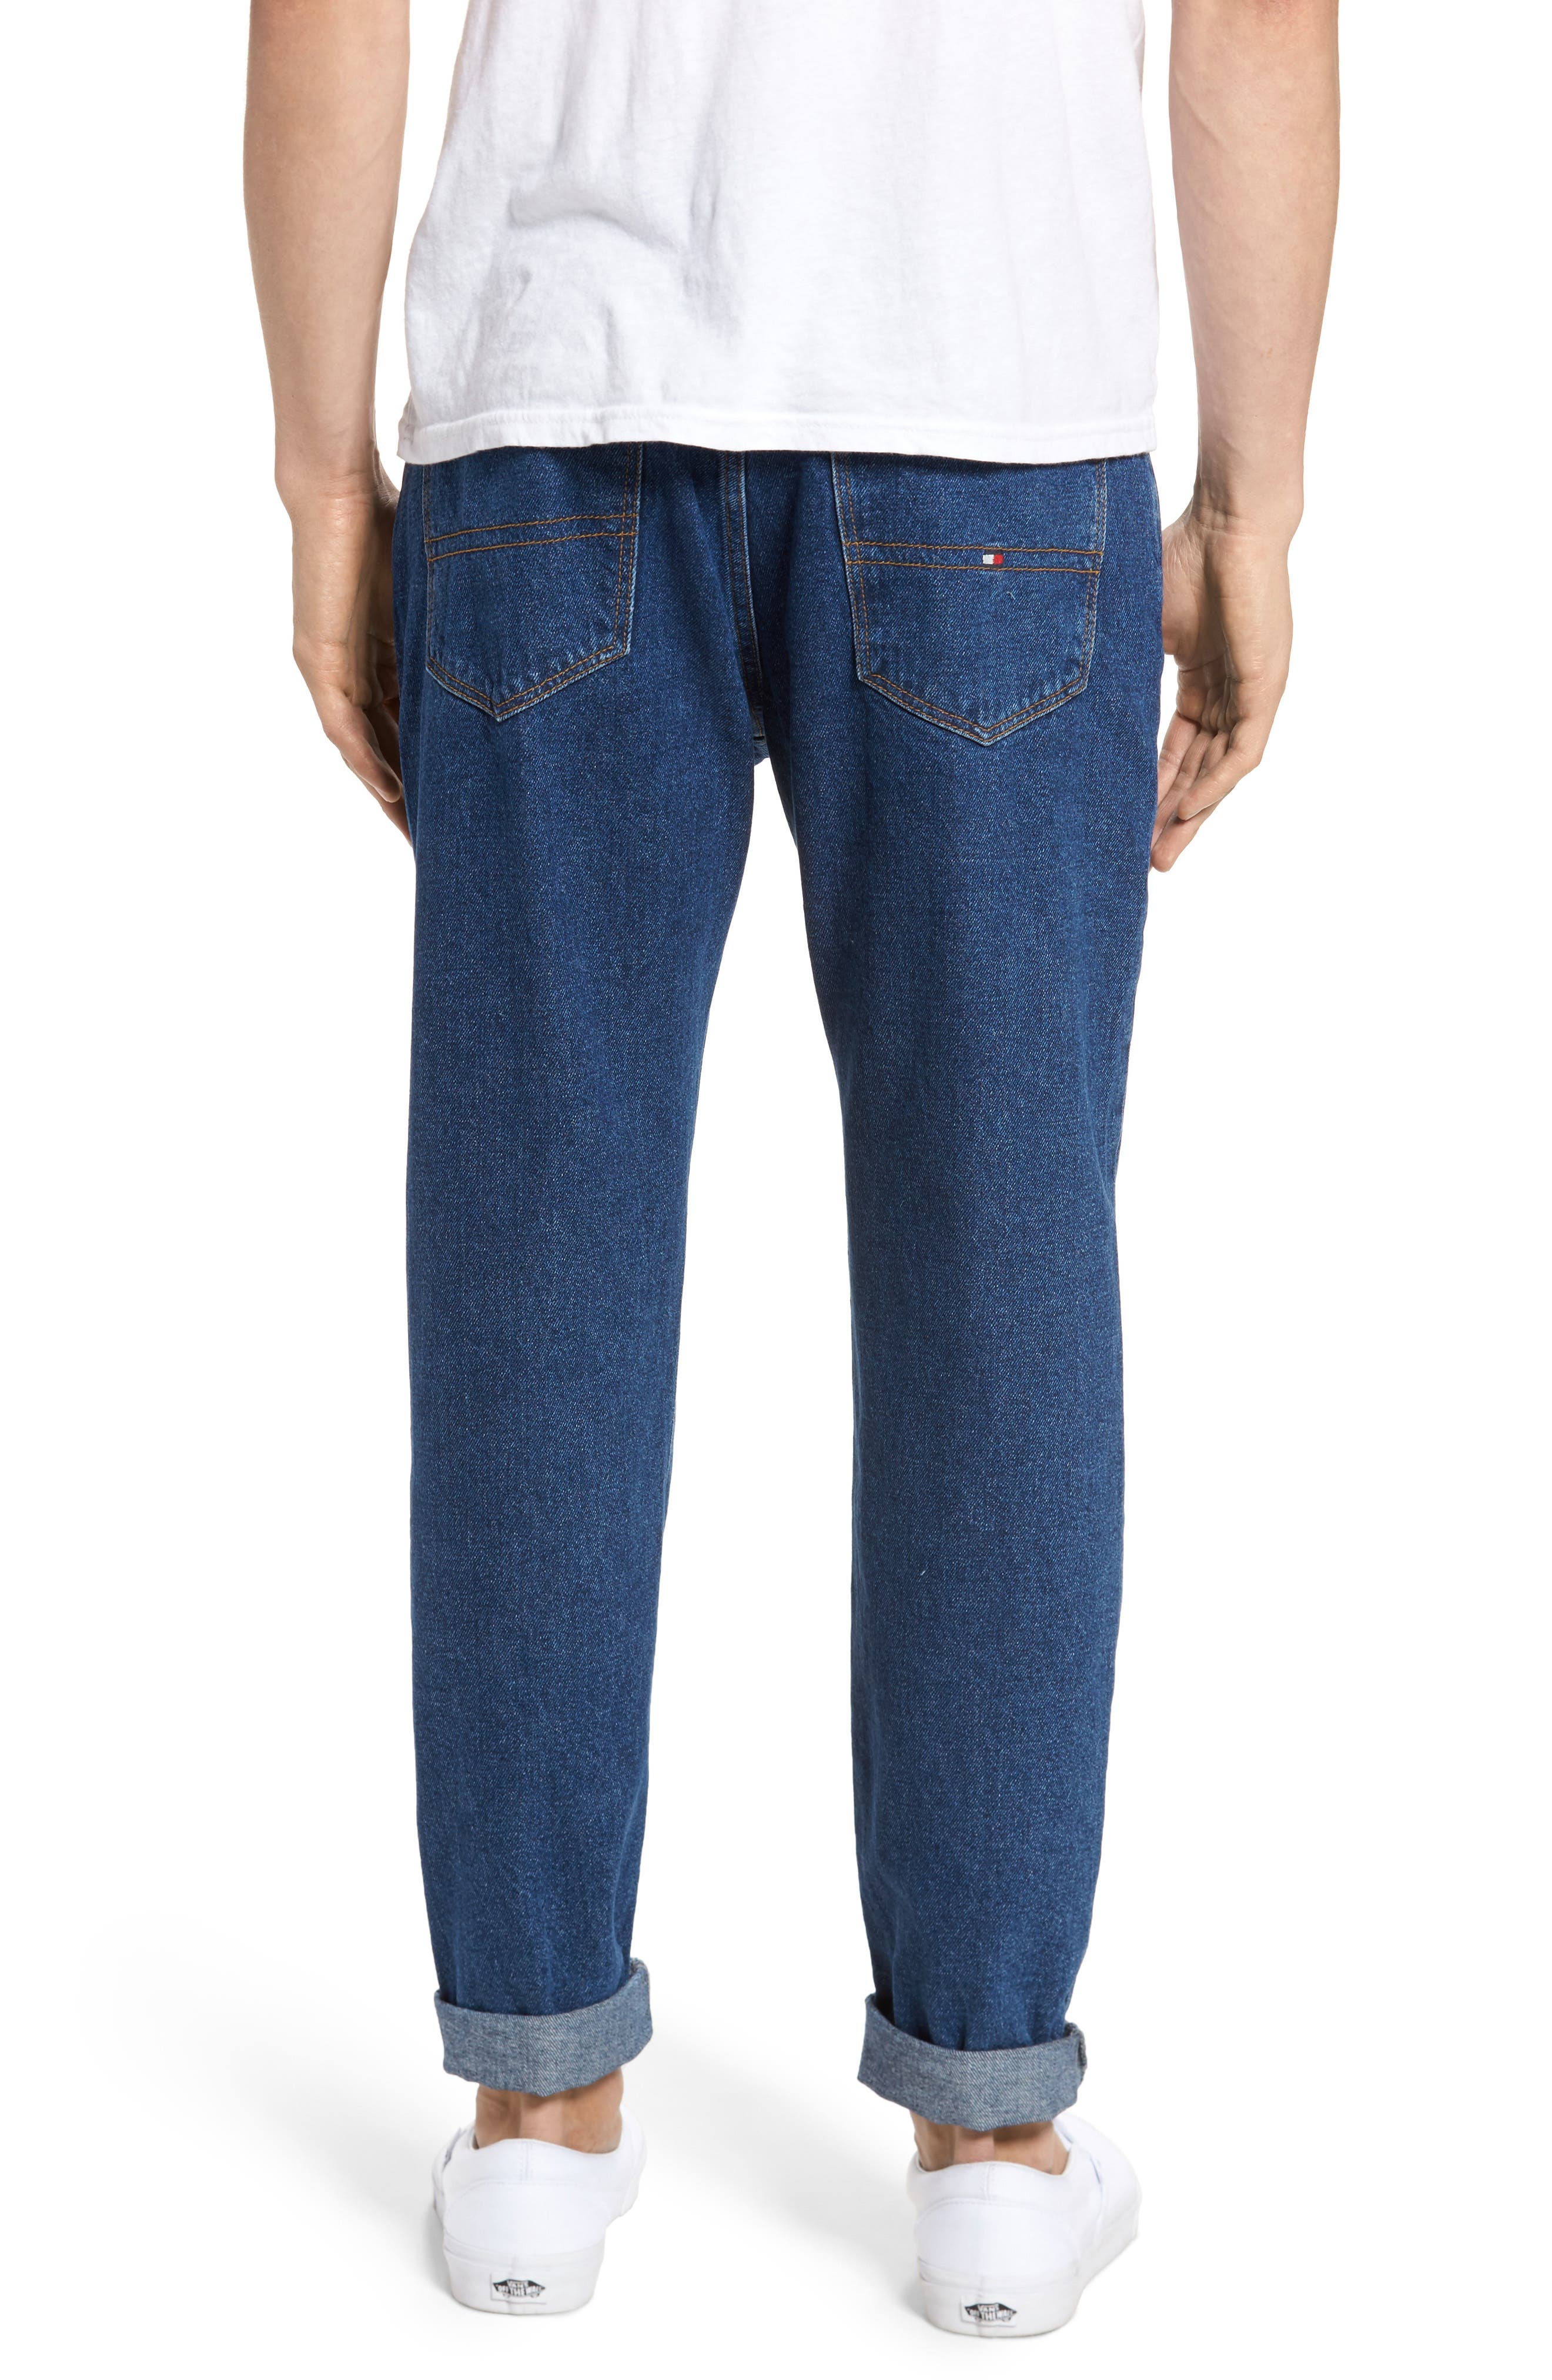 90s Classic Straight Leg Jeans,                             Alternate thumbnail 2, color,                             Denim Blue